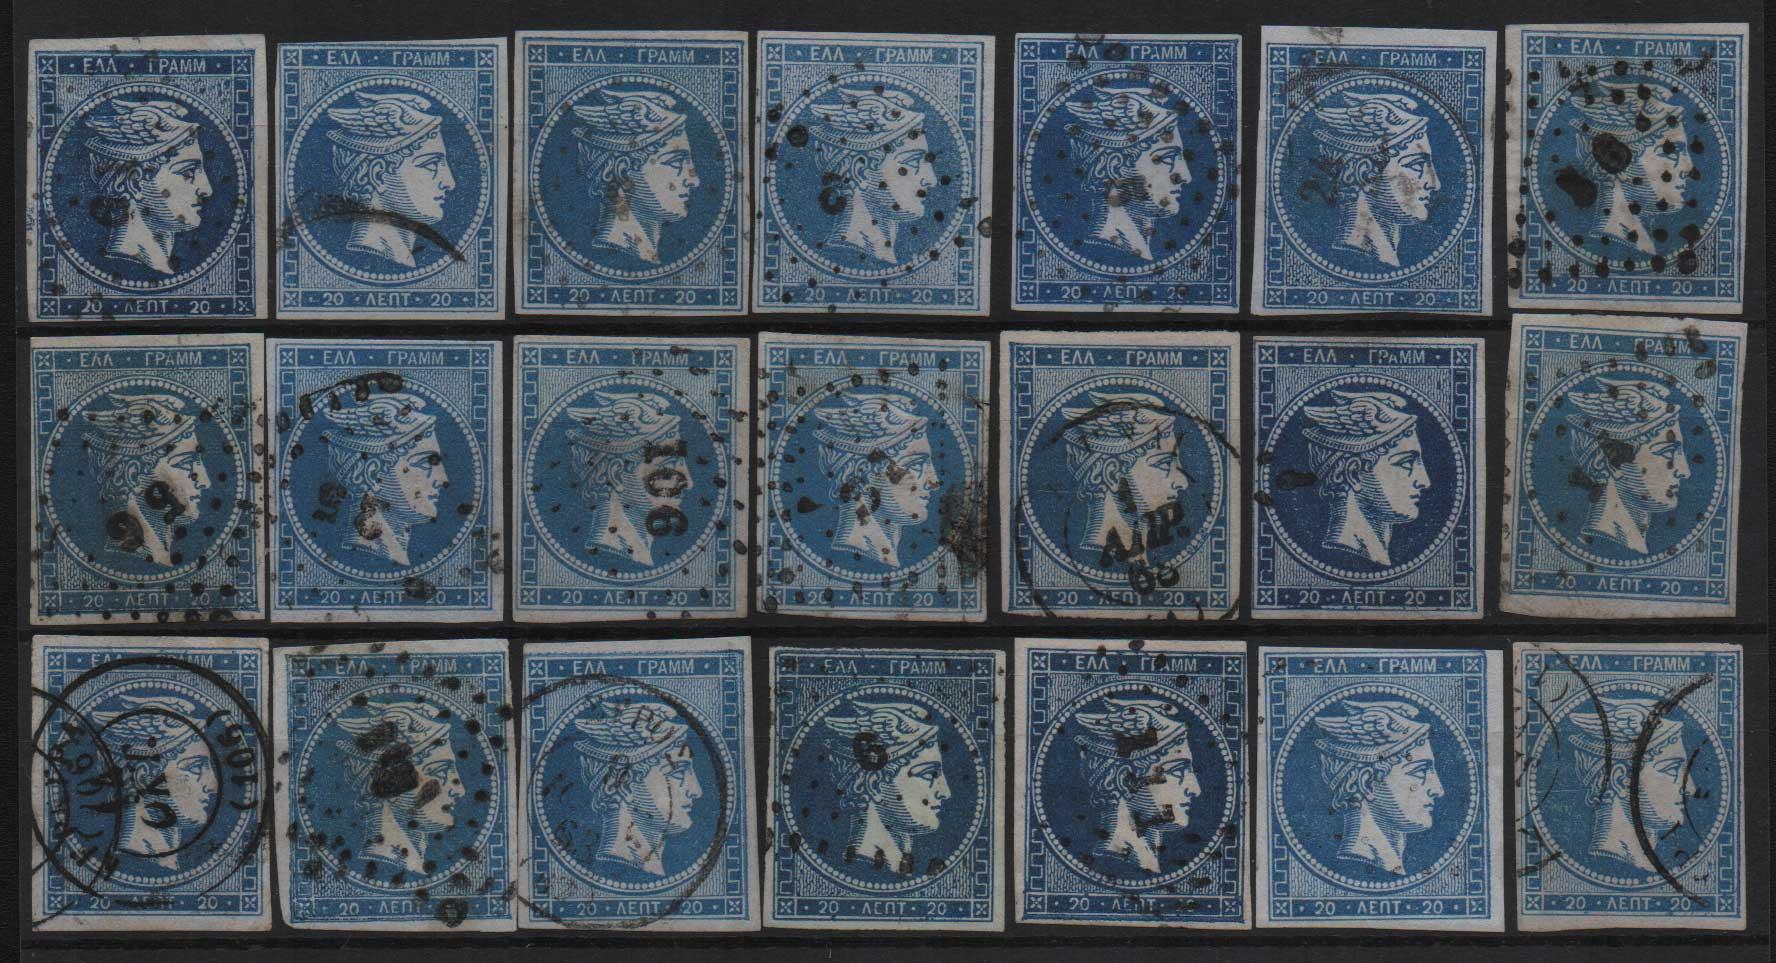 Lot 31 - -  LARGE HERMES HEAD large hermes head -  Athens Auctions Public Auction 76 General Stamp Sale